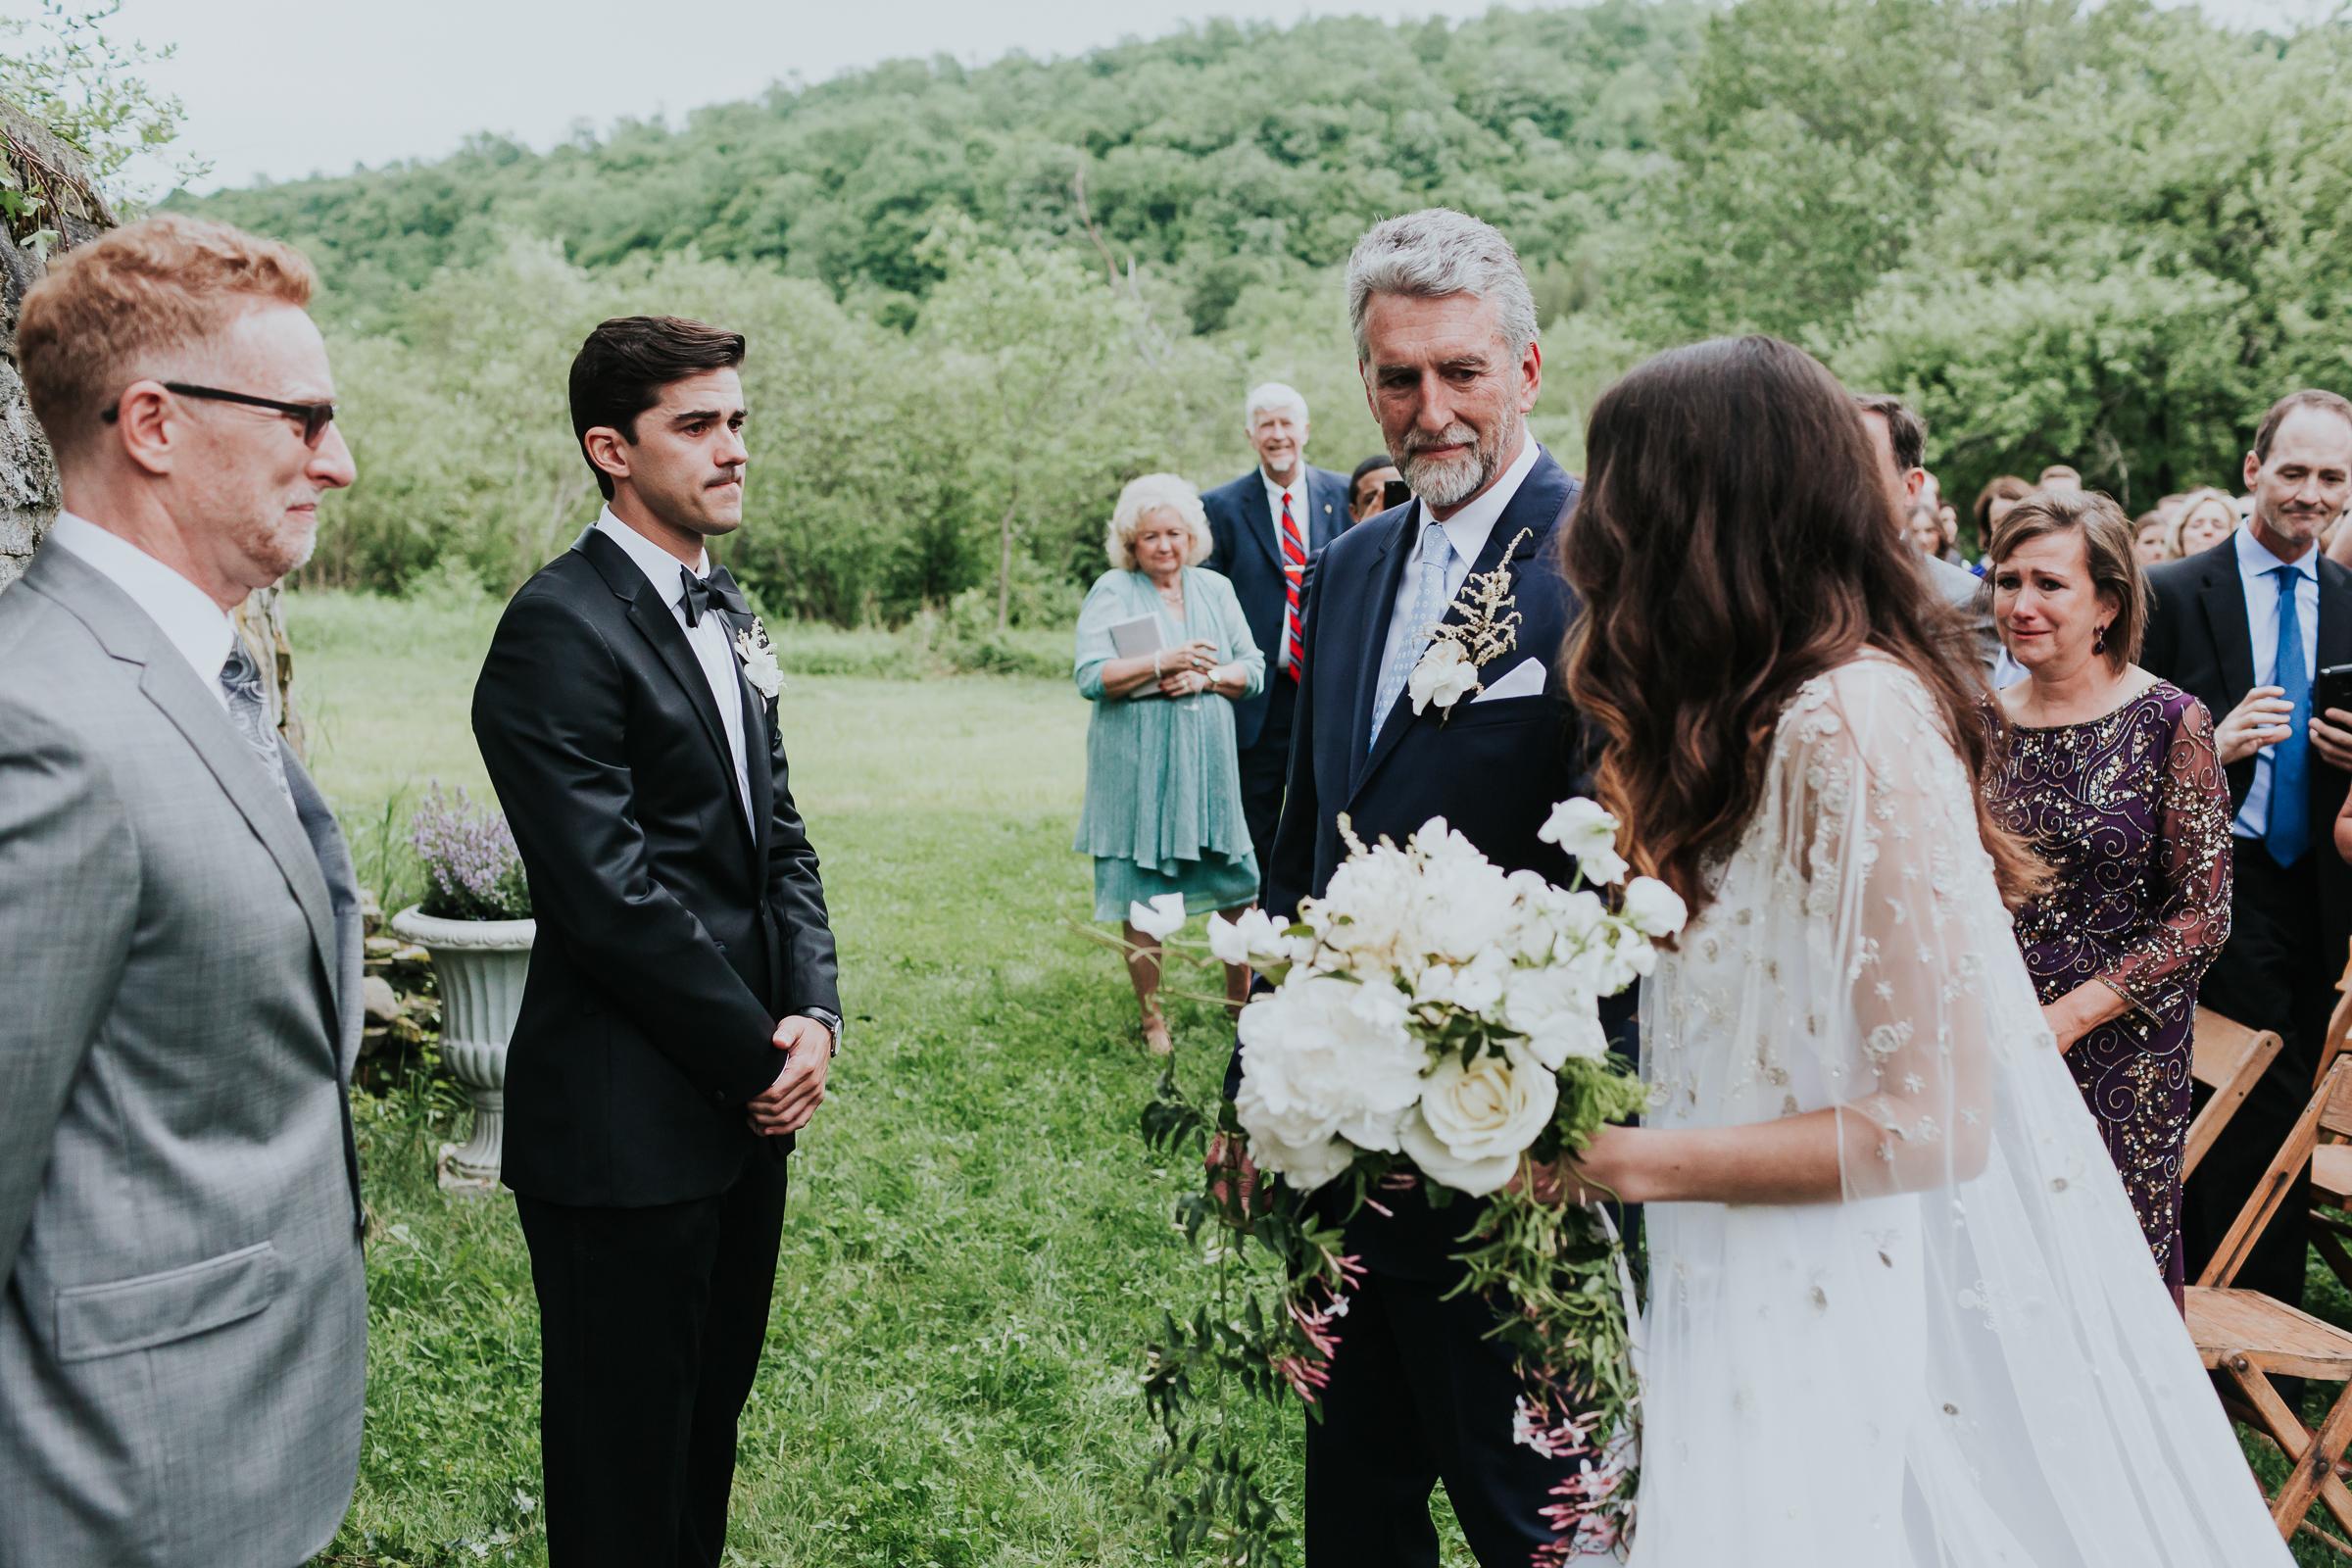 Handsome-Hollow-Long-Eddy-Catskills-New-York-Fine-Art-Documentary-Wedding-Photographer-61.jpg